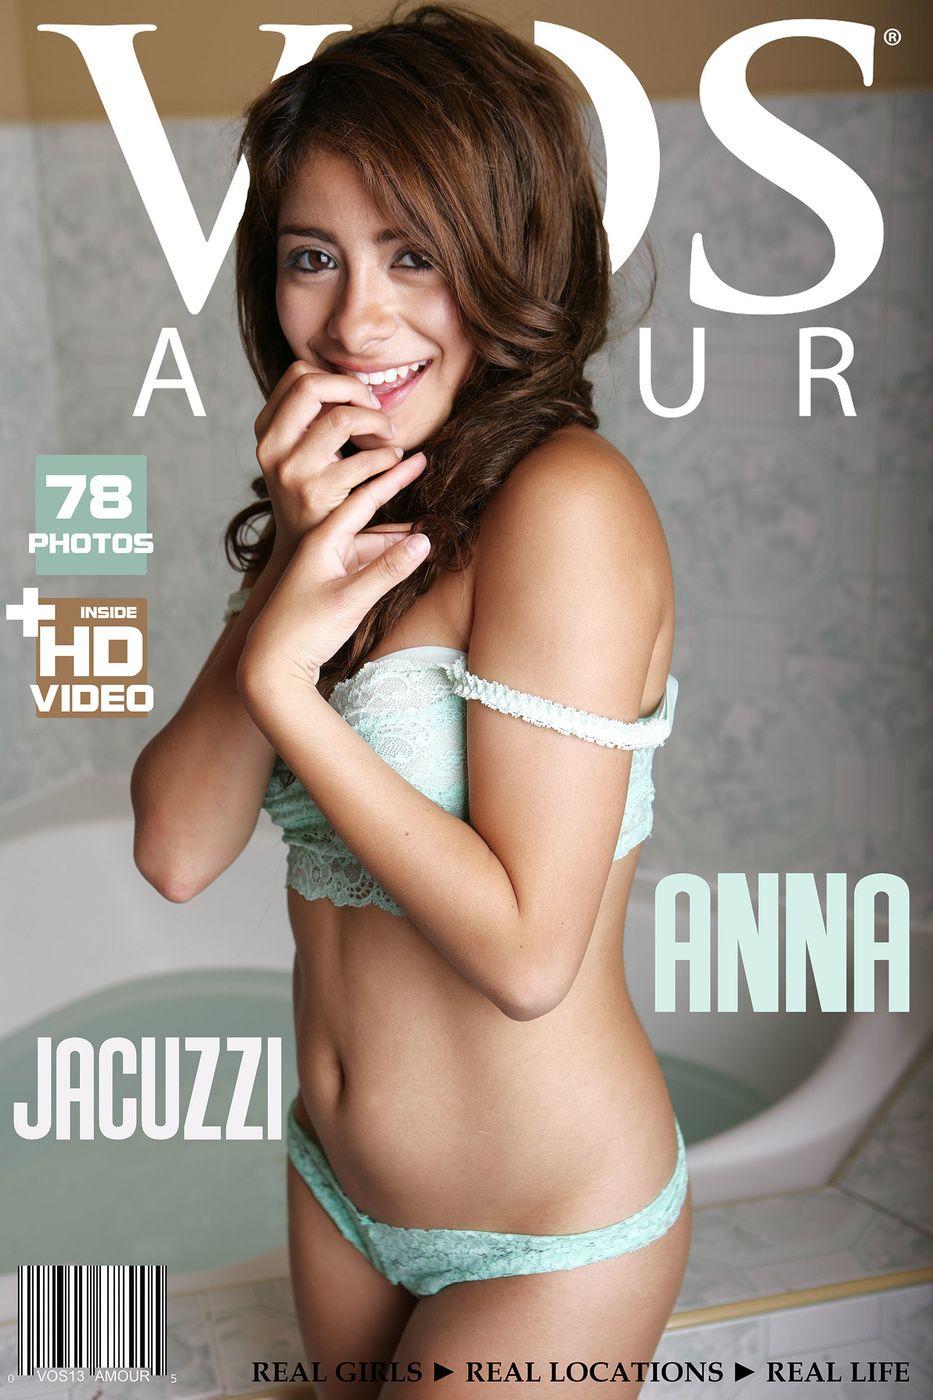 Box Of Photos Anna Jacuzzi Bts Video Sexy Girl Sexygirls Lingerie Underwear Sensual Gorgeous Women Girls